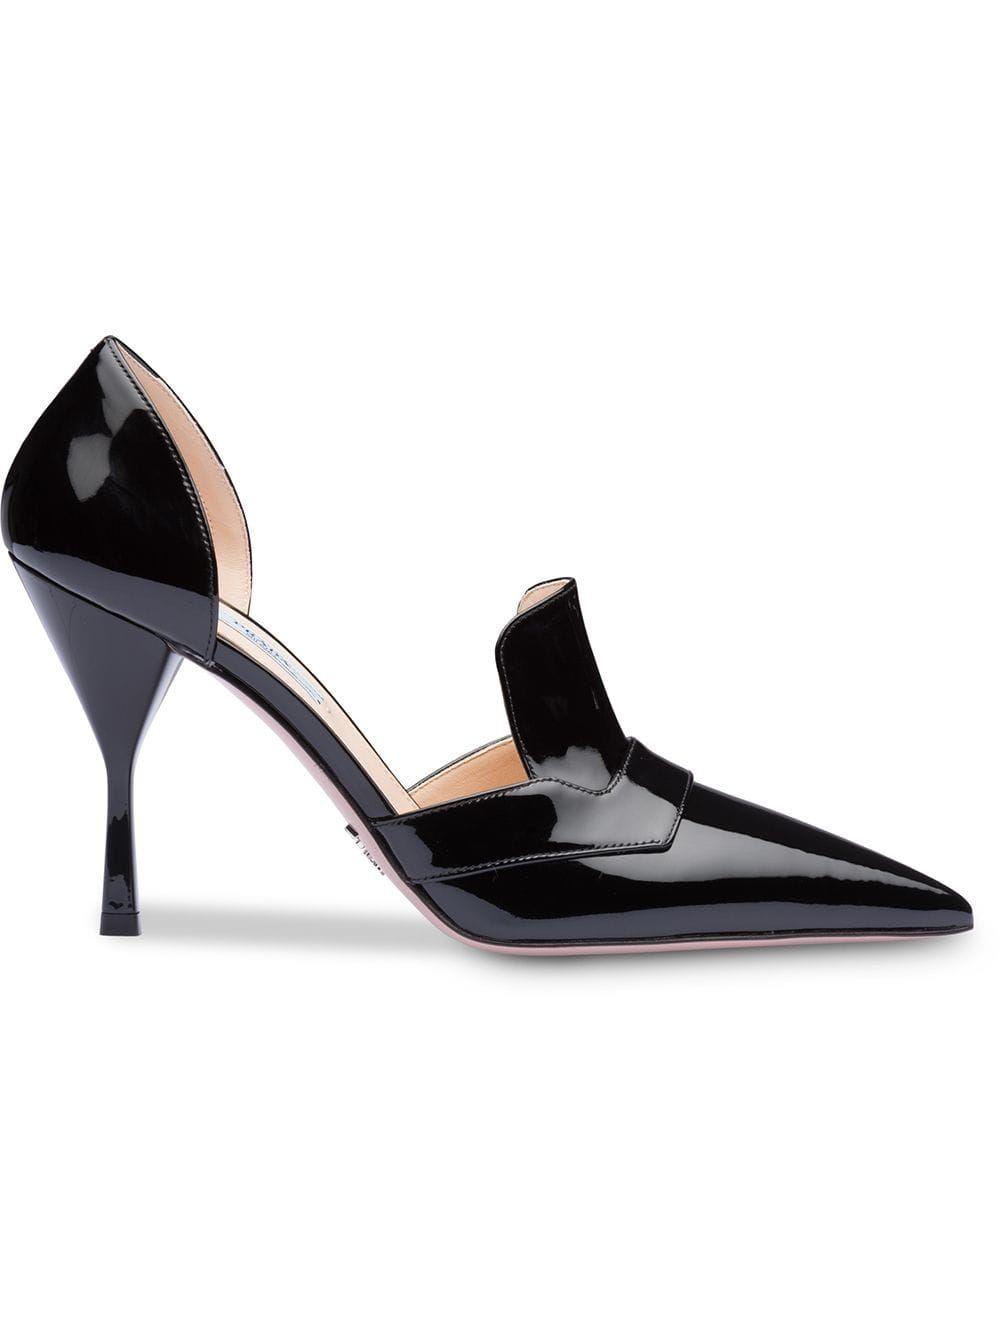 815ca65067741 Prada patent pointed pumps - Black Prada Patent Pointed Pumps - Farfetch  Kitten Heels, Prada